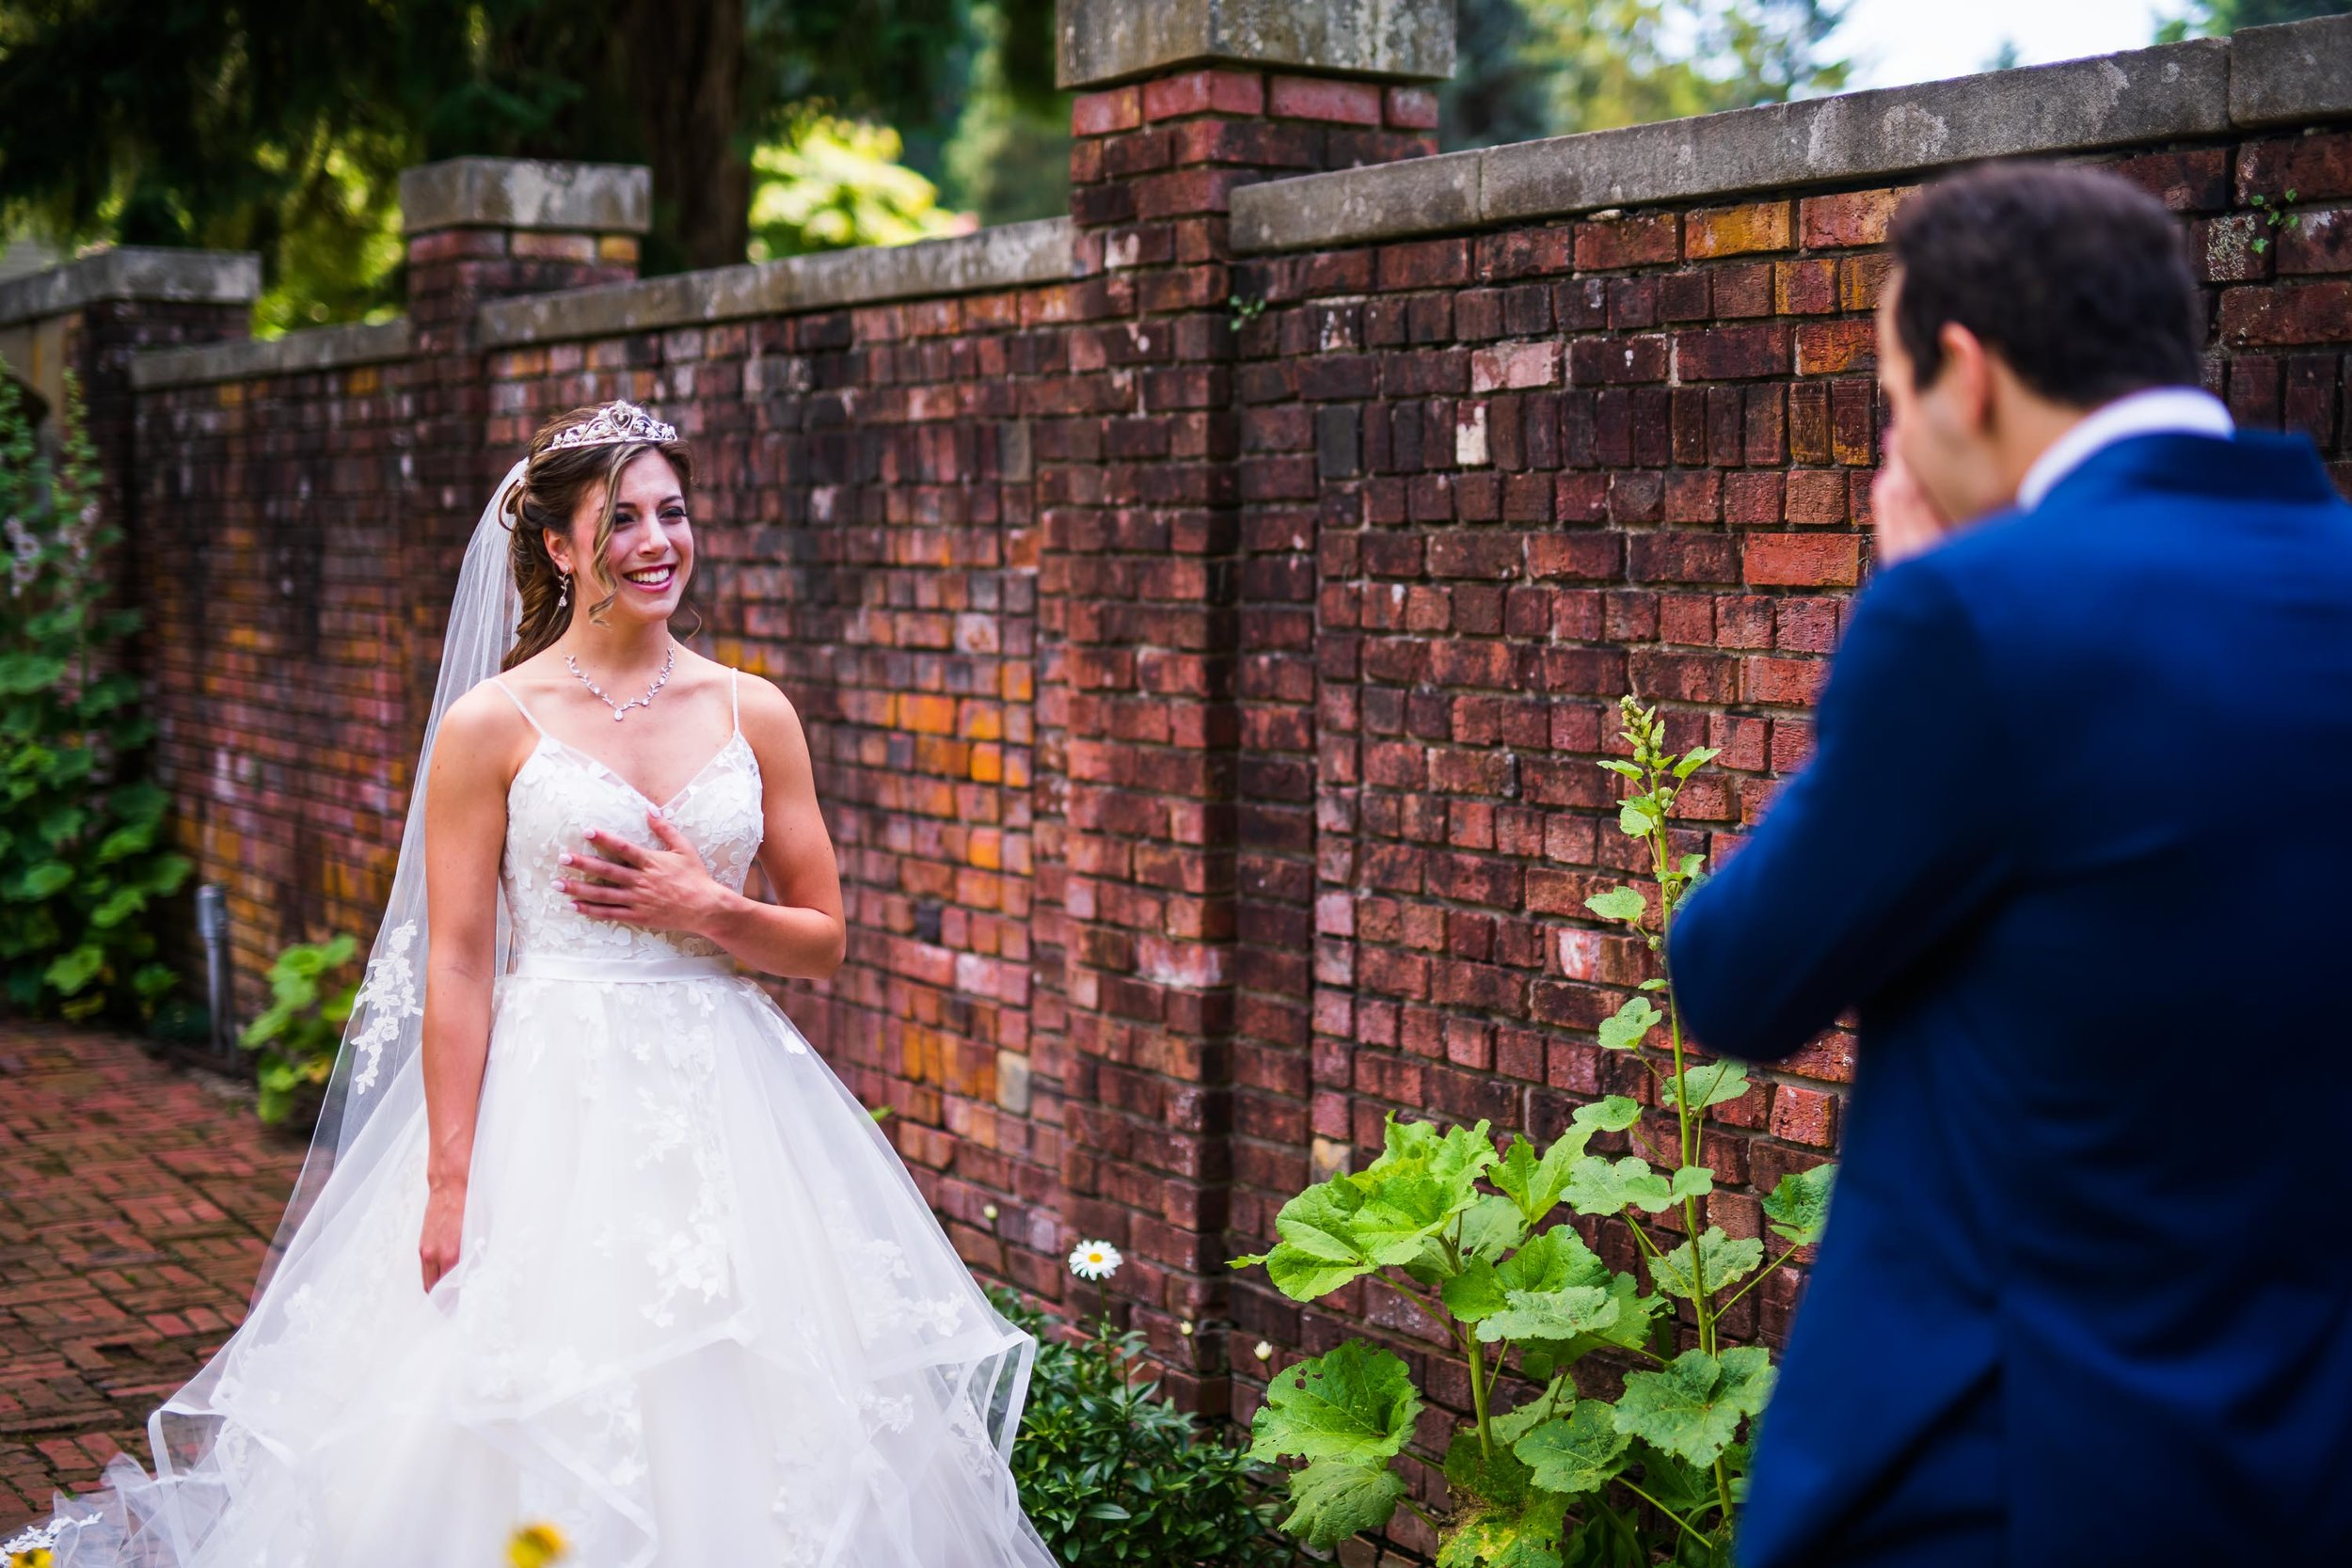 thornewood castle wedding 13.jpg